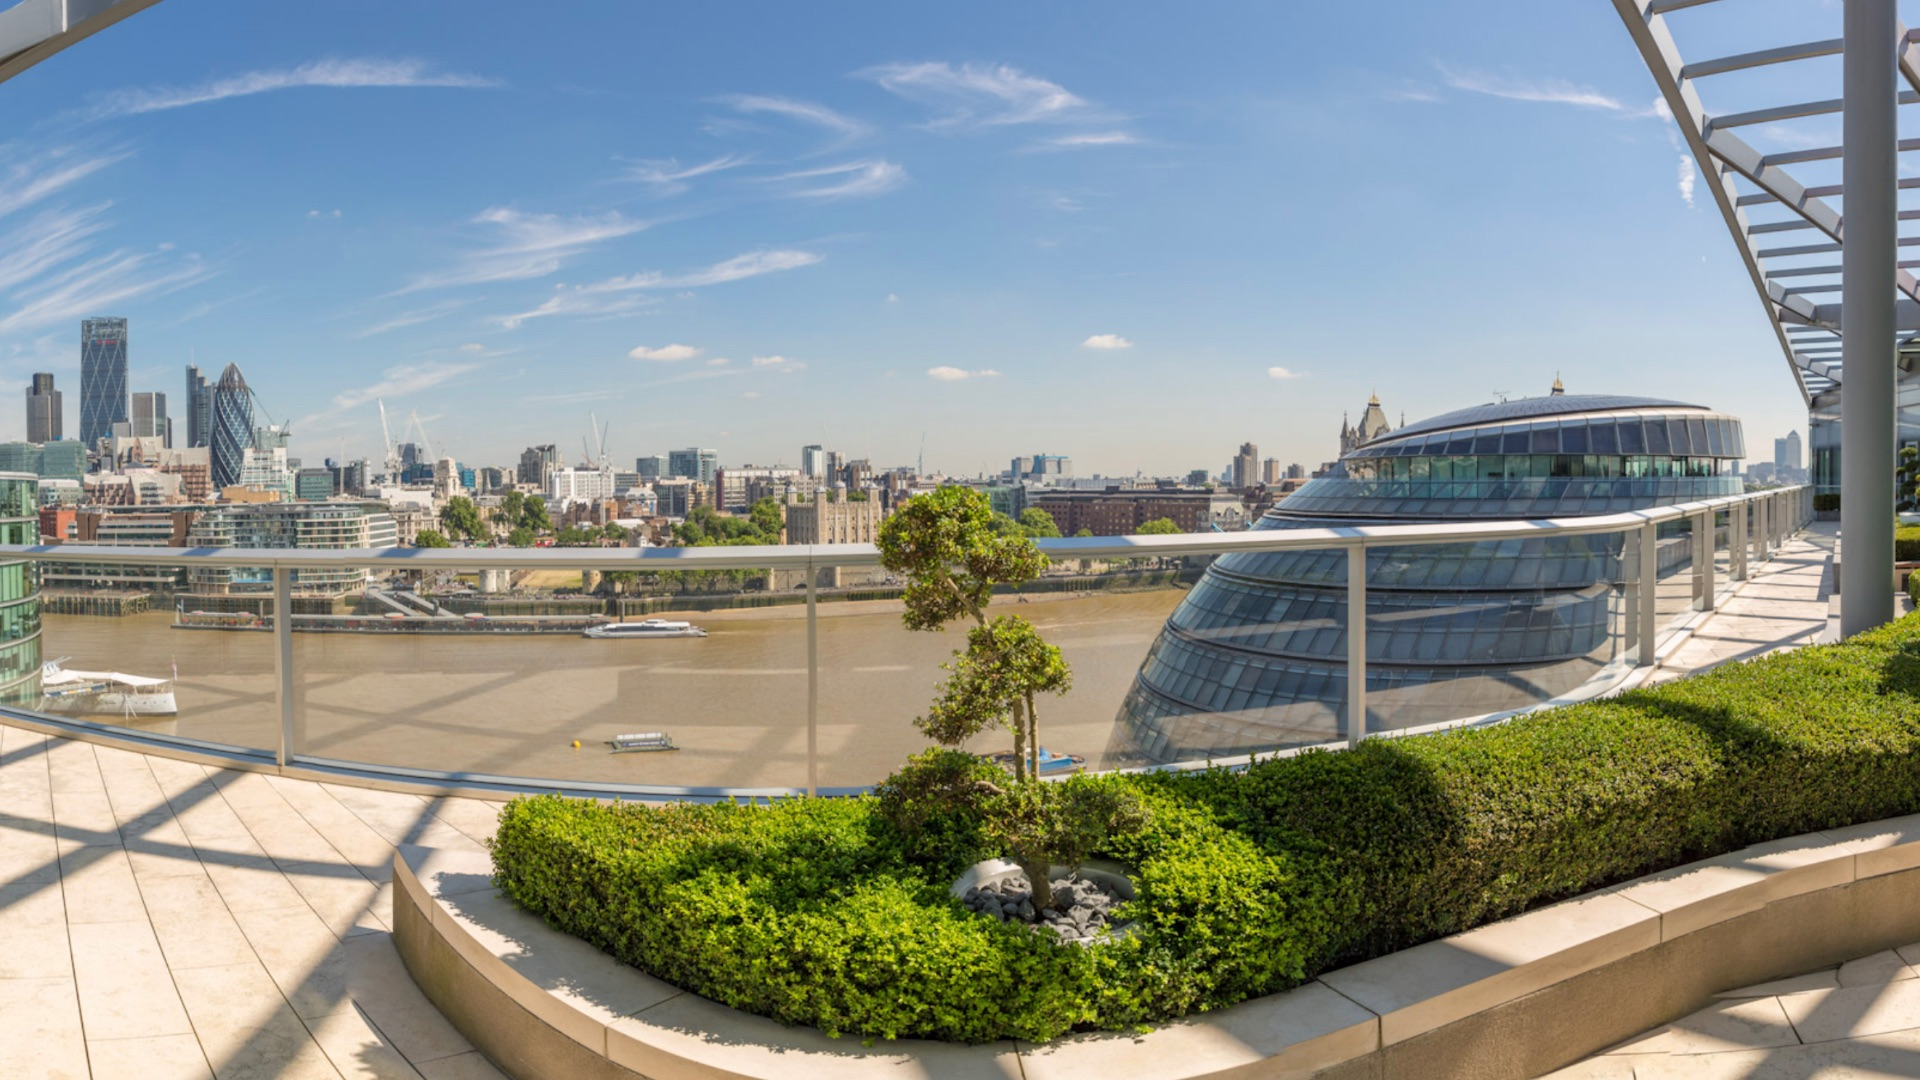 london office rooftop garden